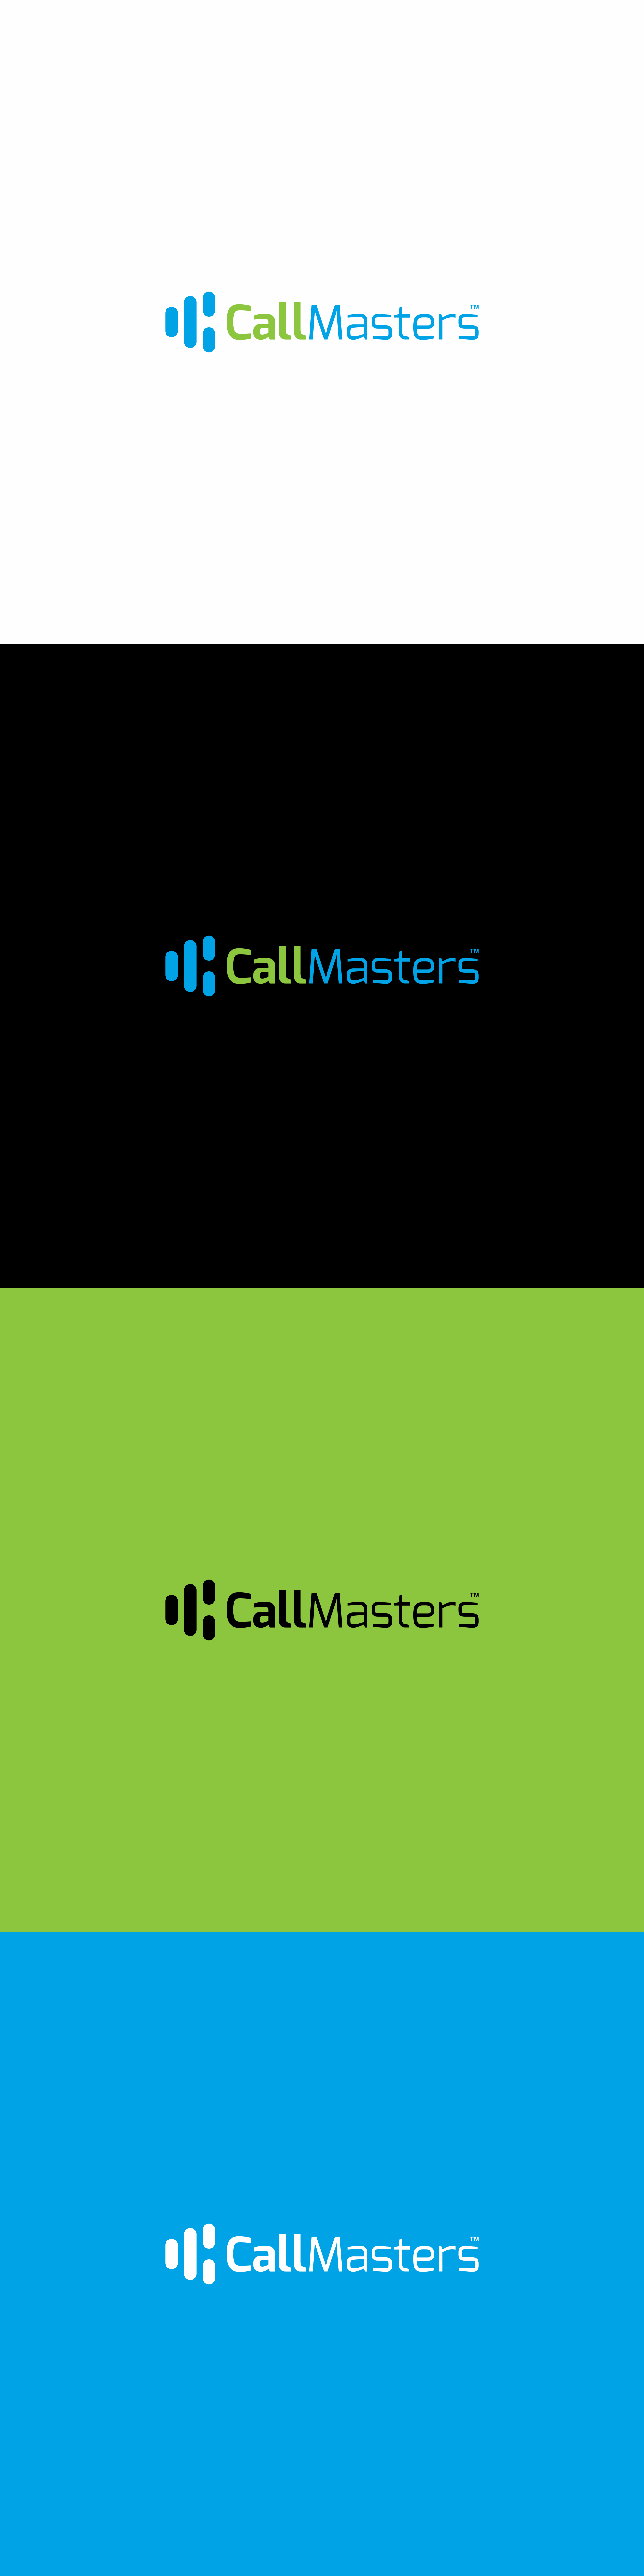 Логотип call-центра Callmasters  фото f_7545b75c9c9a3f6c.jpg